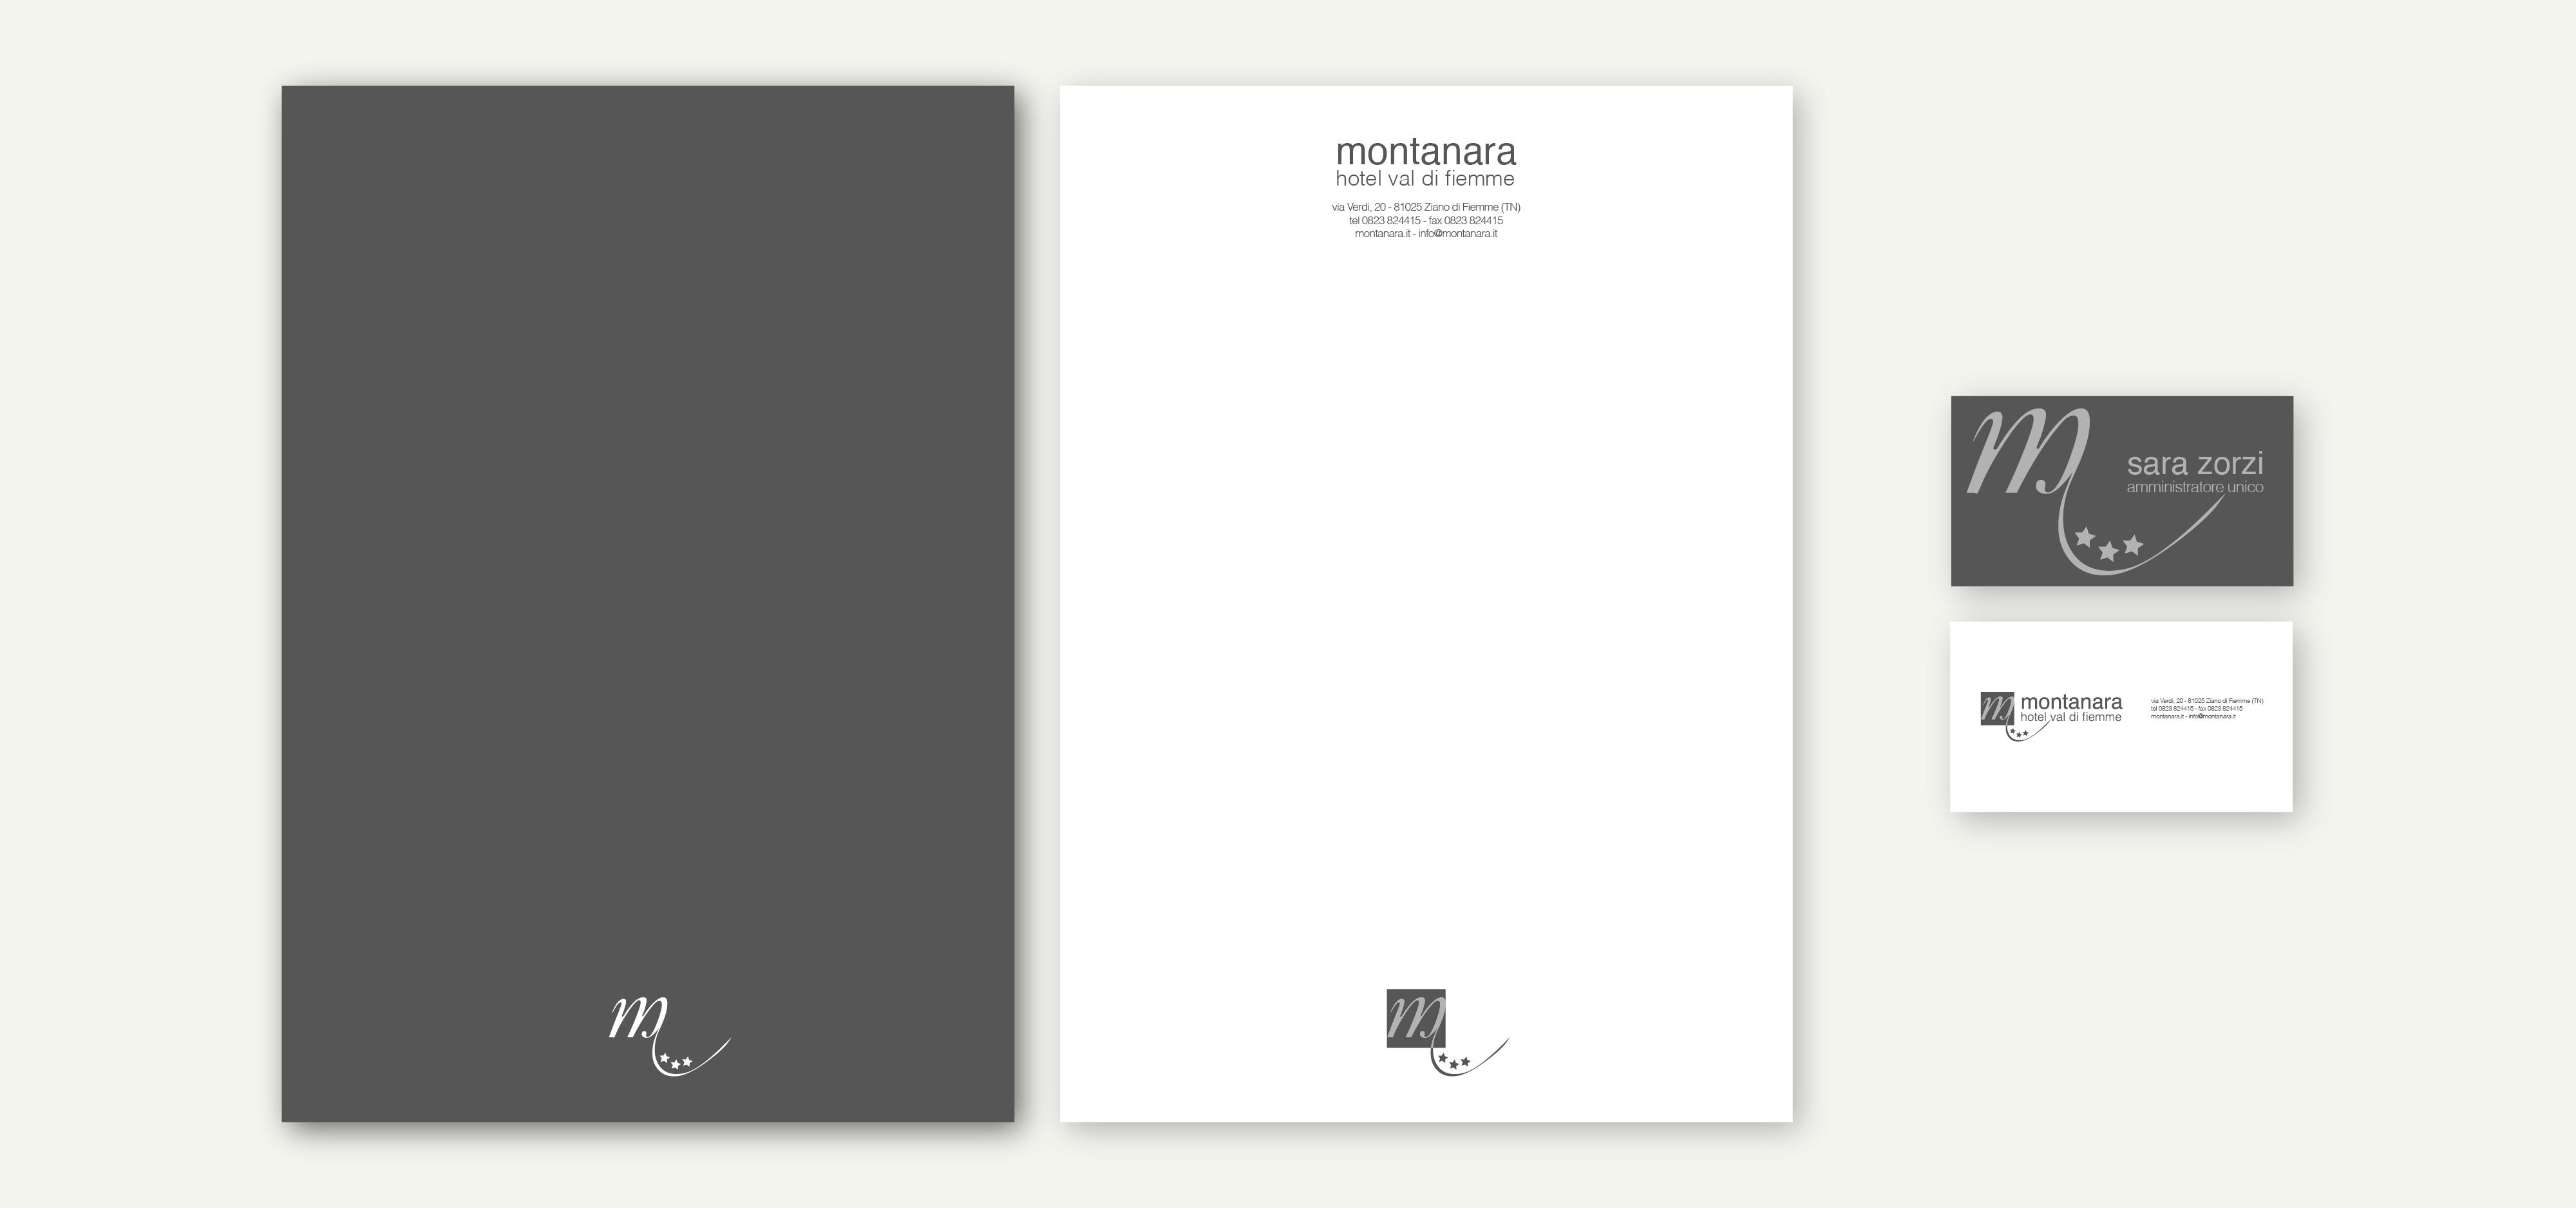 montanara-07